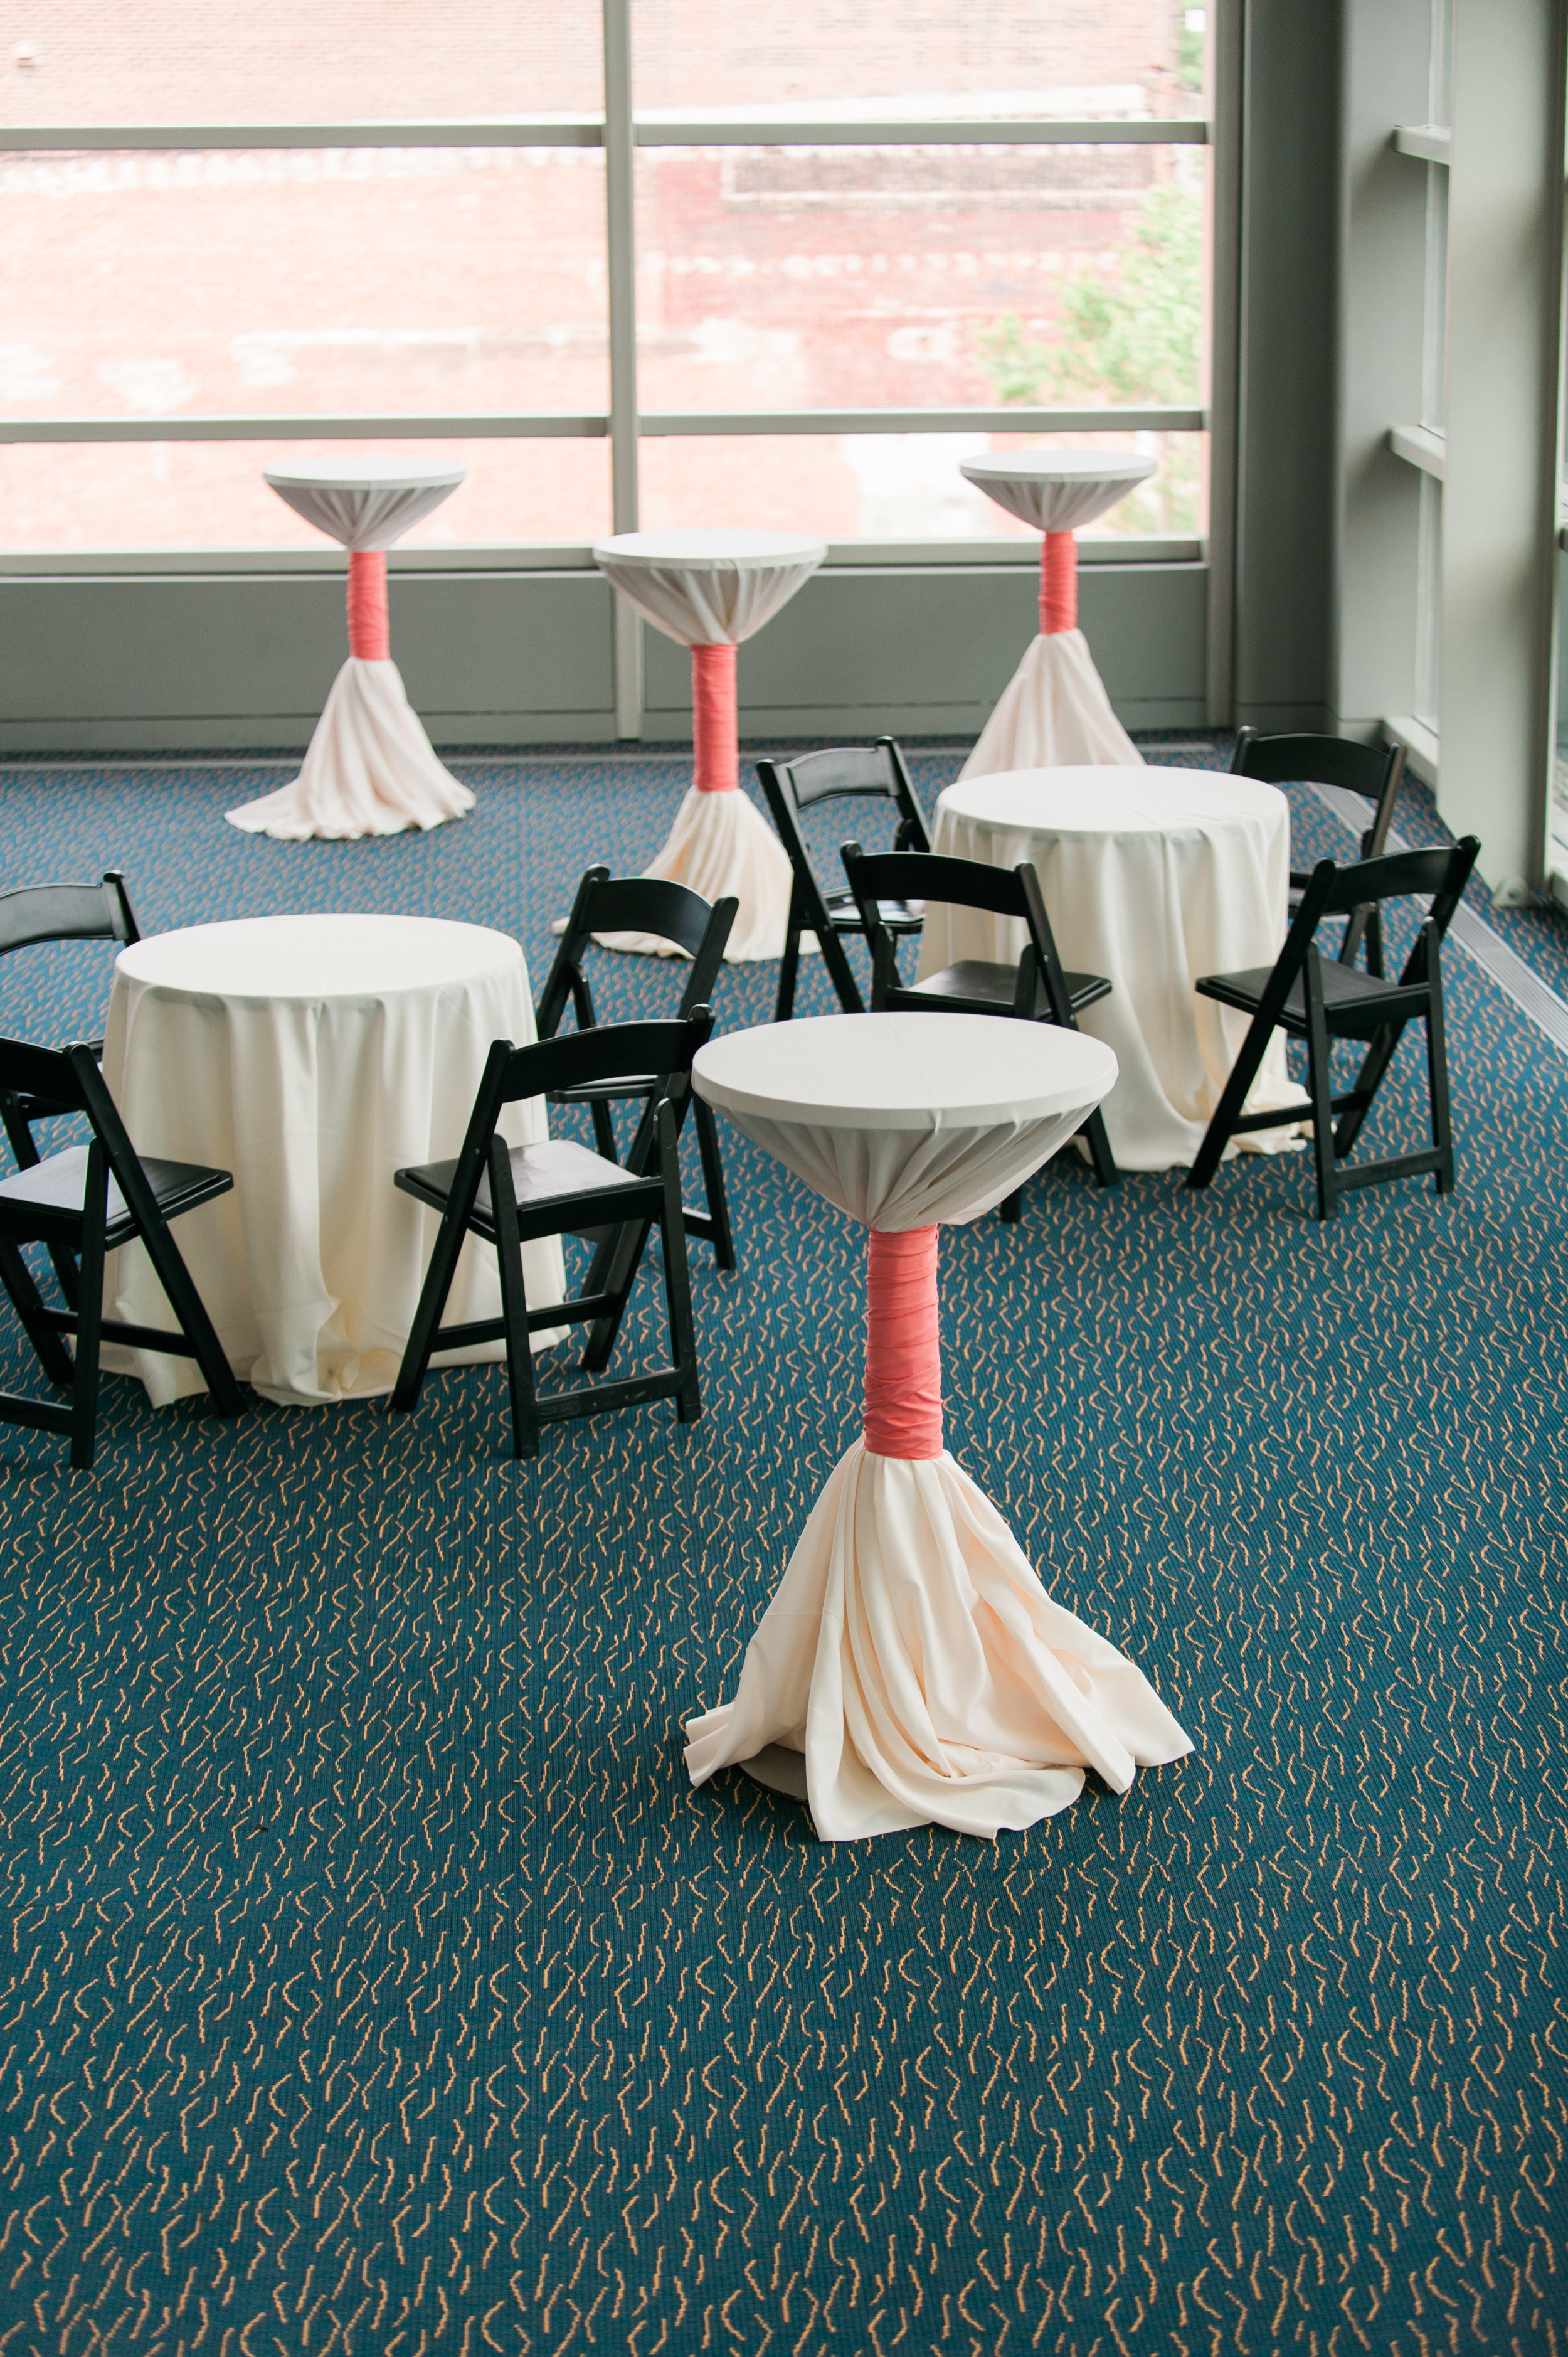 omaha-holland-arts-center-wedding-50.jpg